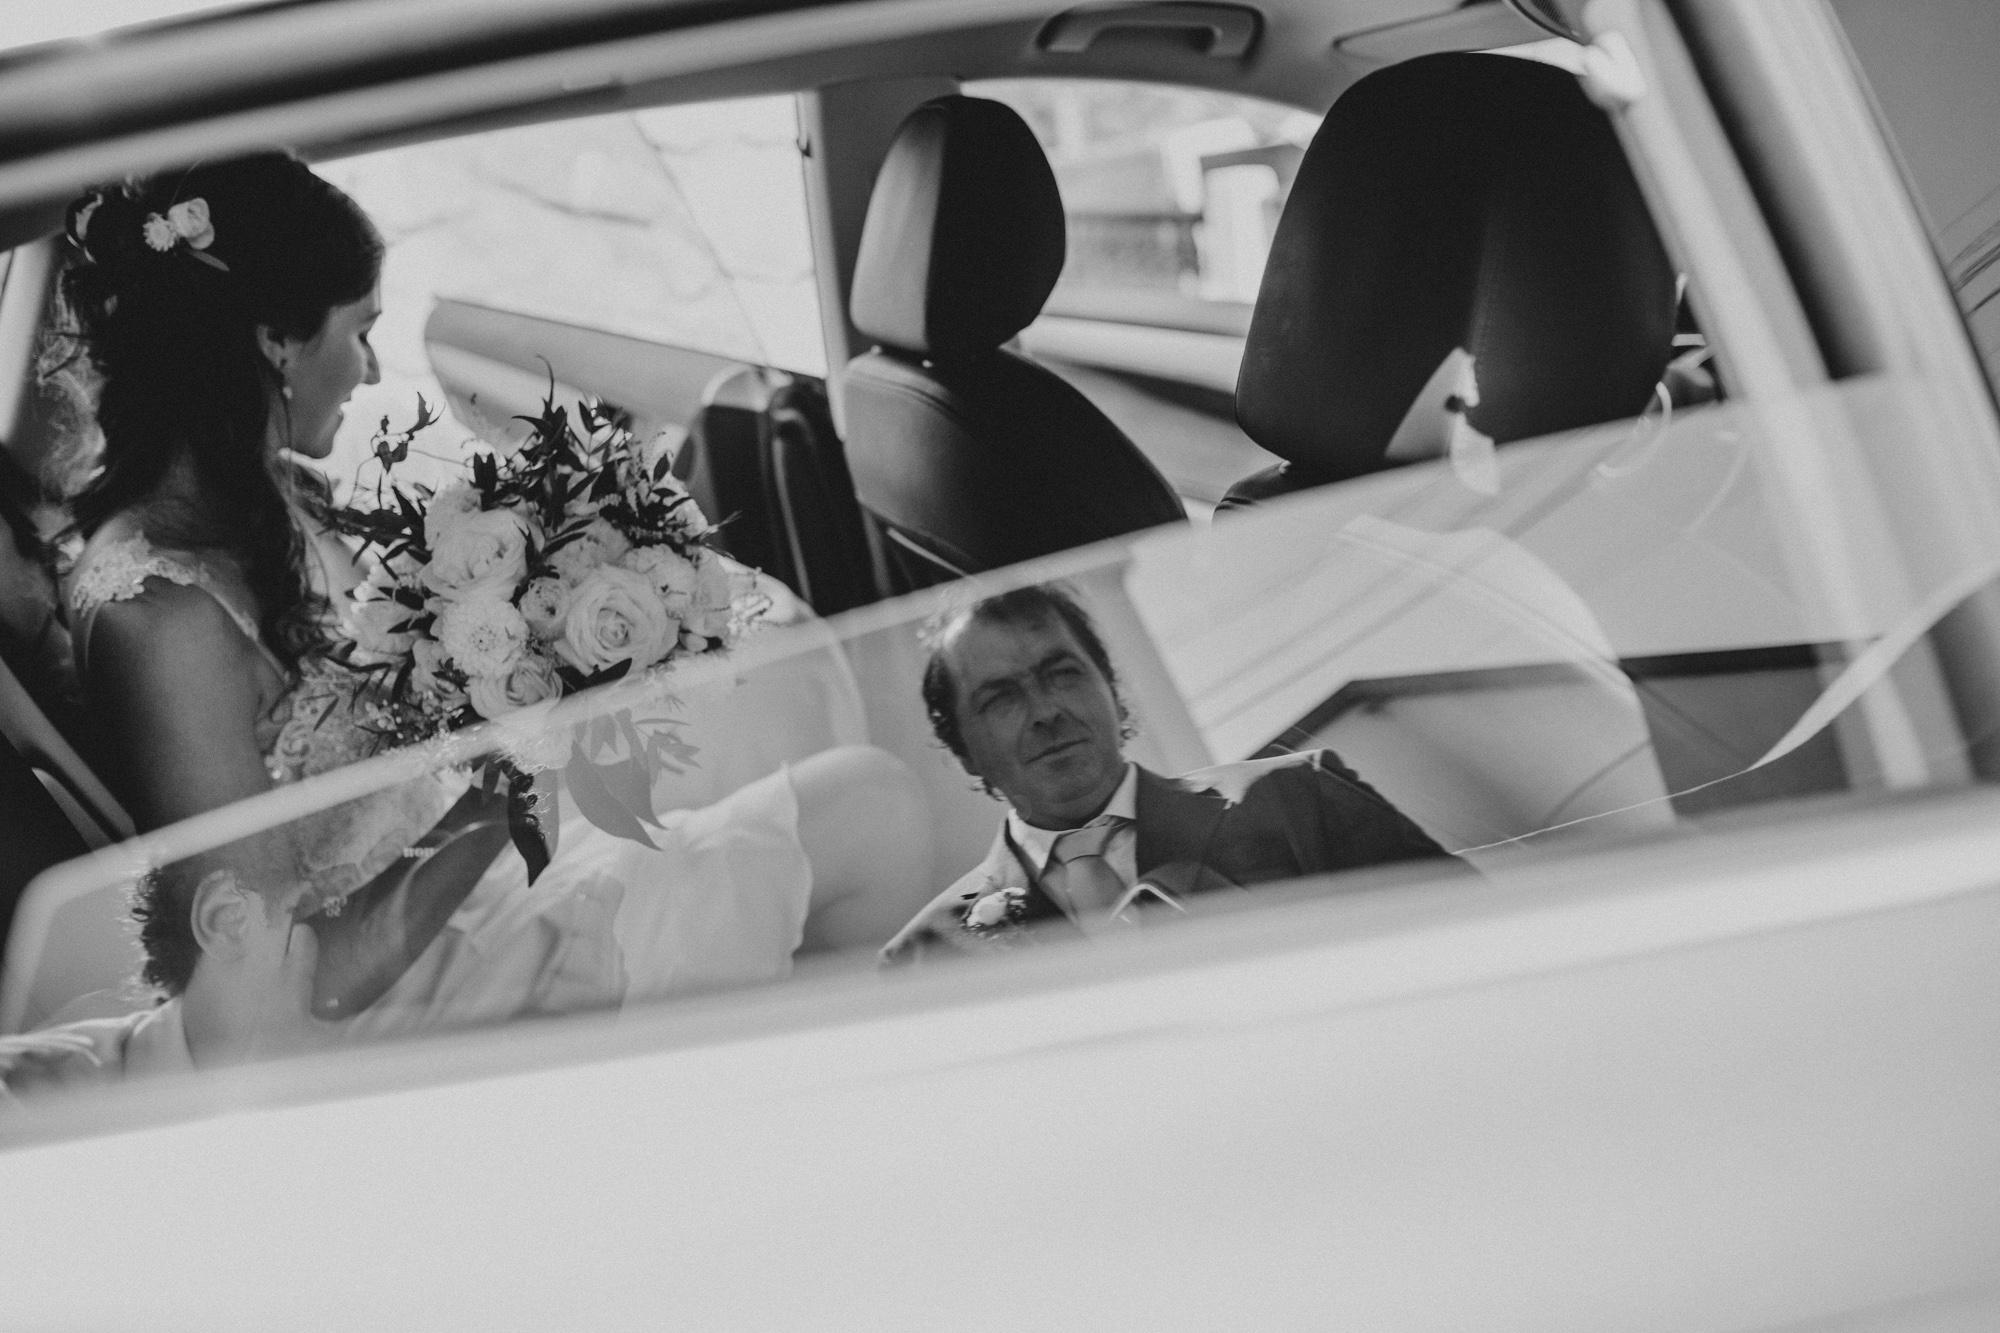 069-carina-e-samuel-wedding-casamento-quinta-dos-rouxinois-rustico-my-fancy-wedding-mafra-malveira-lisboa-sintra-cascais-filipe-santiago-fotografia-fotografo-lifestyle-destination-portugal